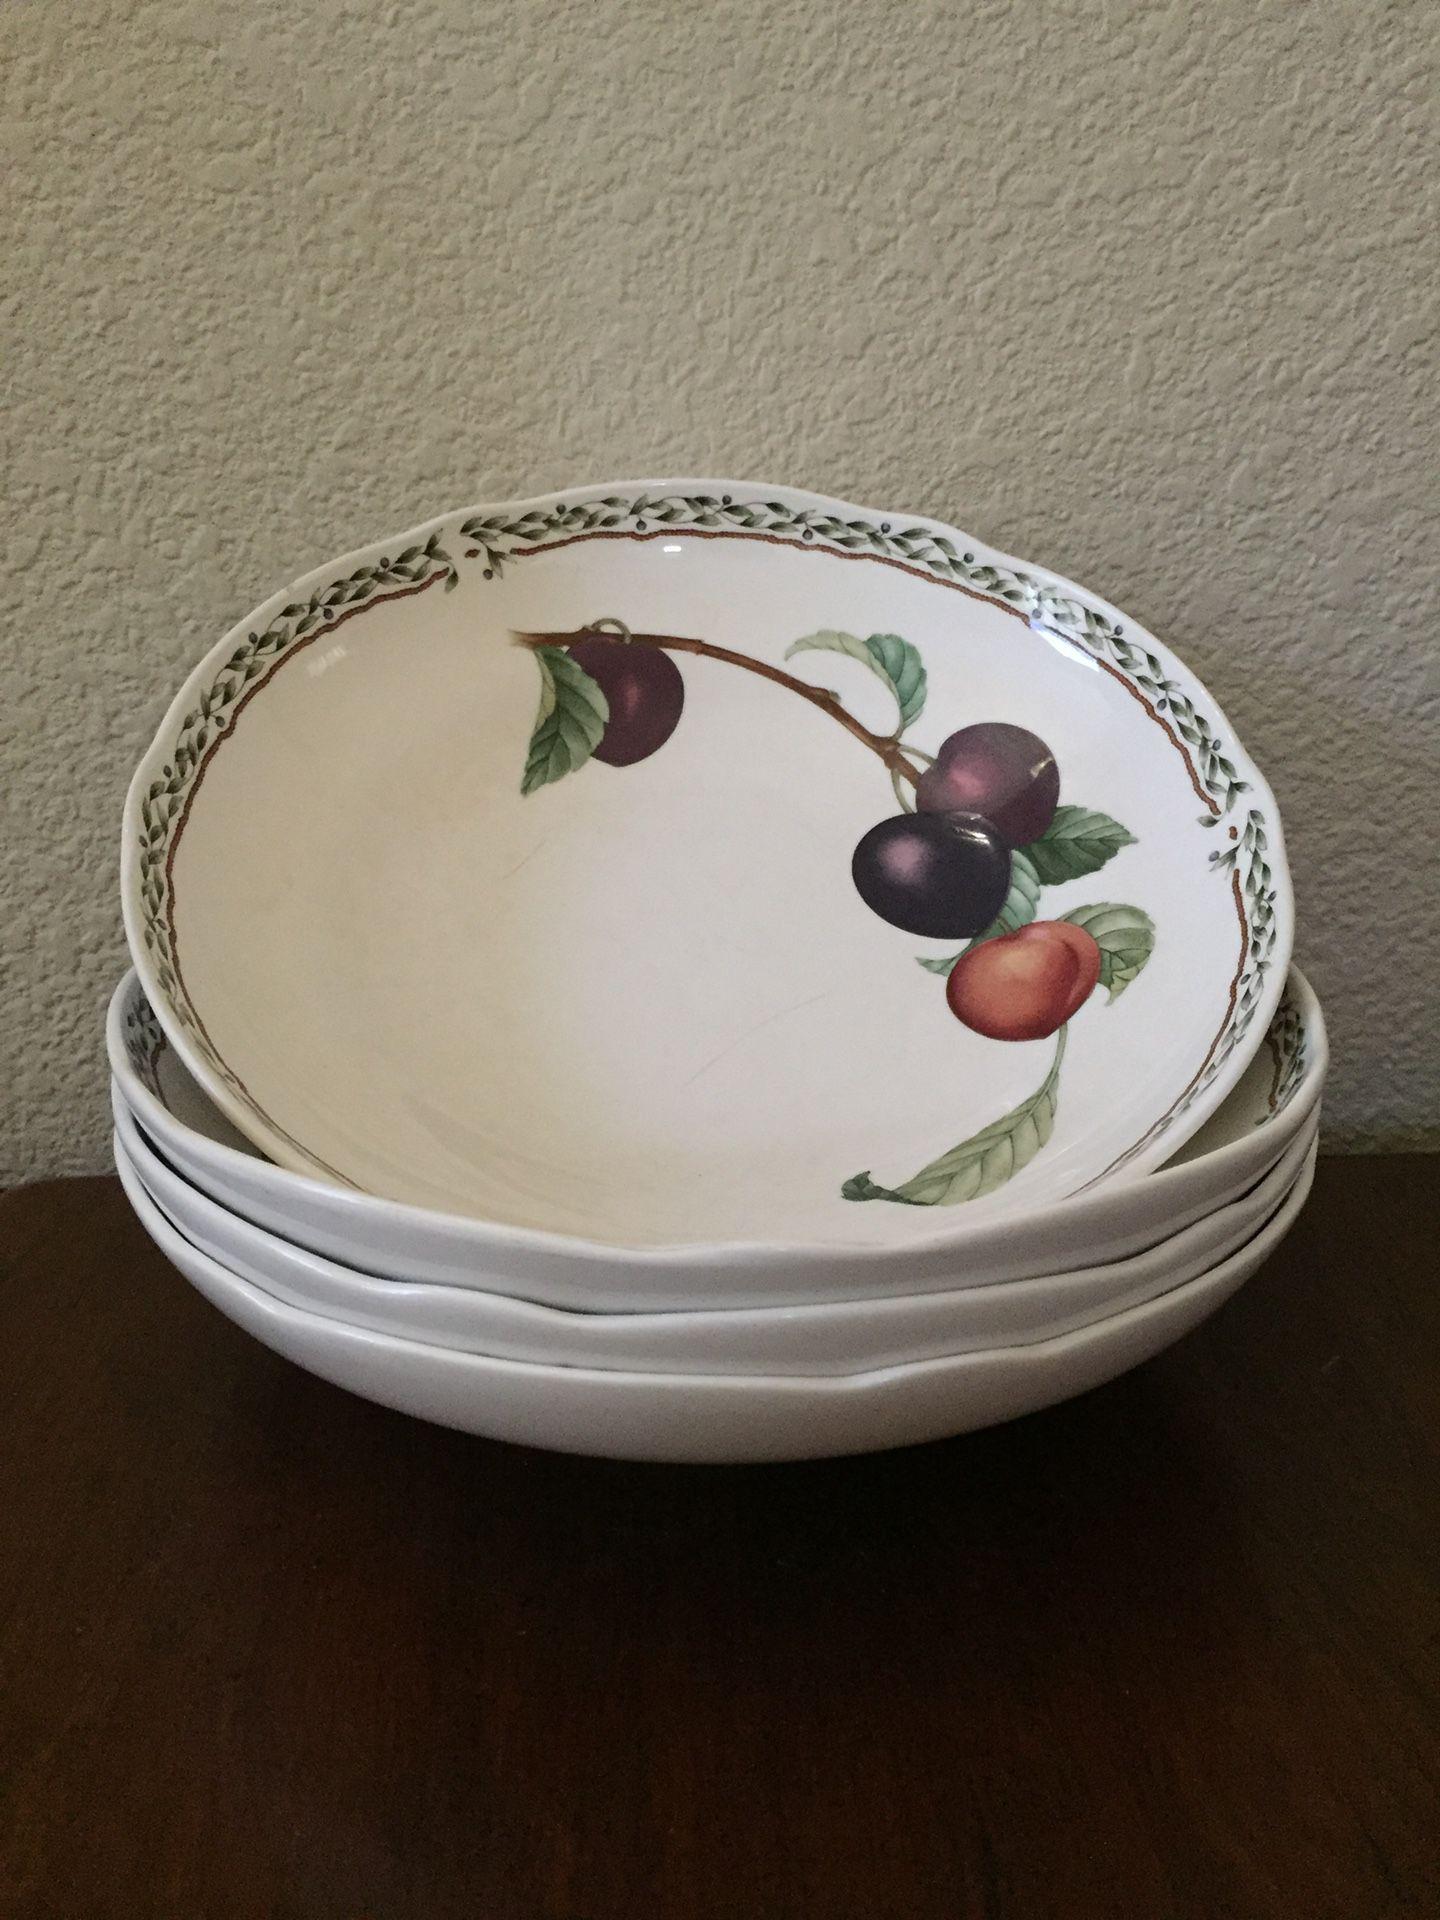 Royal OrchRd by Noritake Cereal Bowl & Fruit Bowl